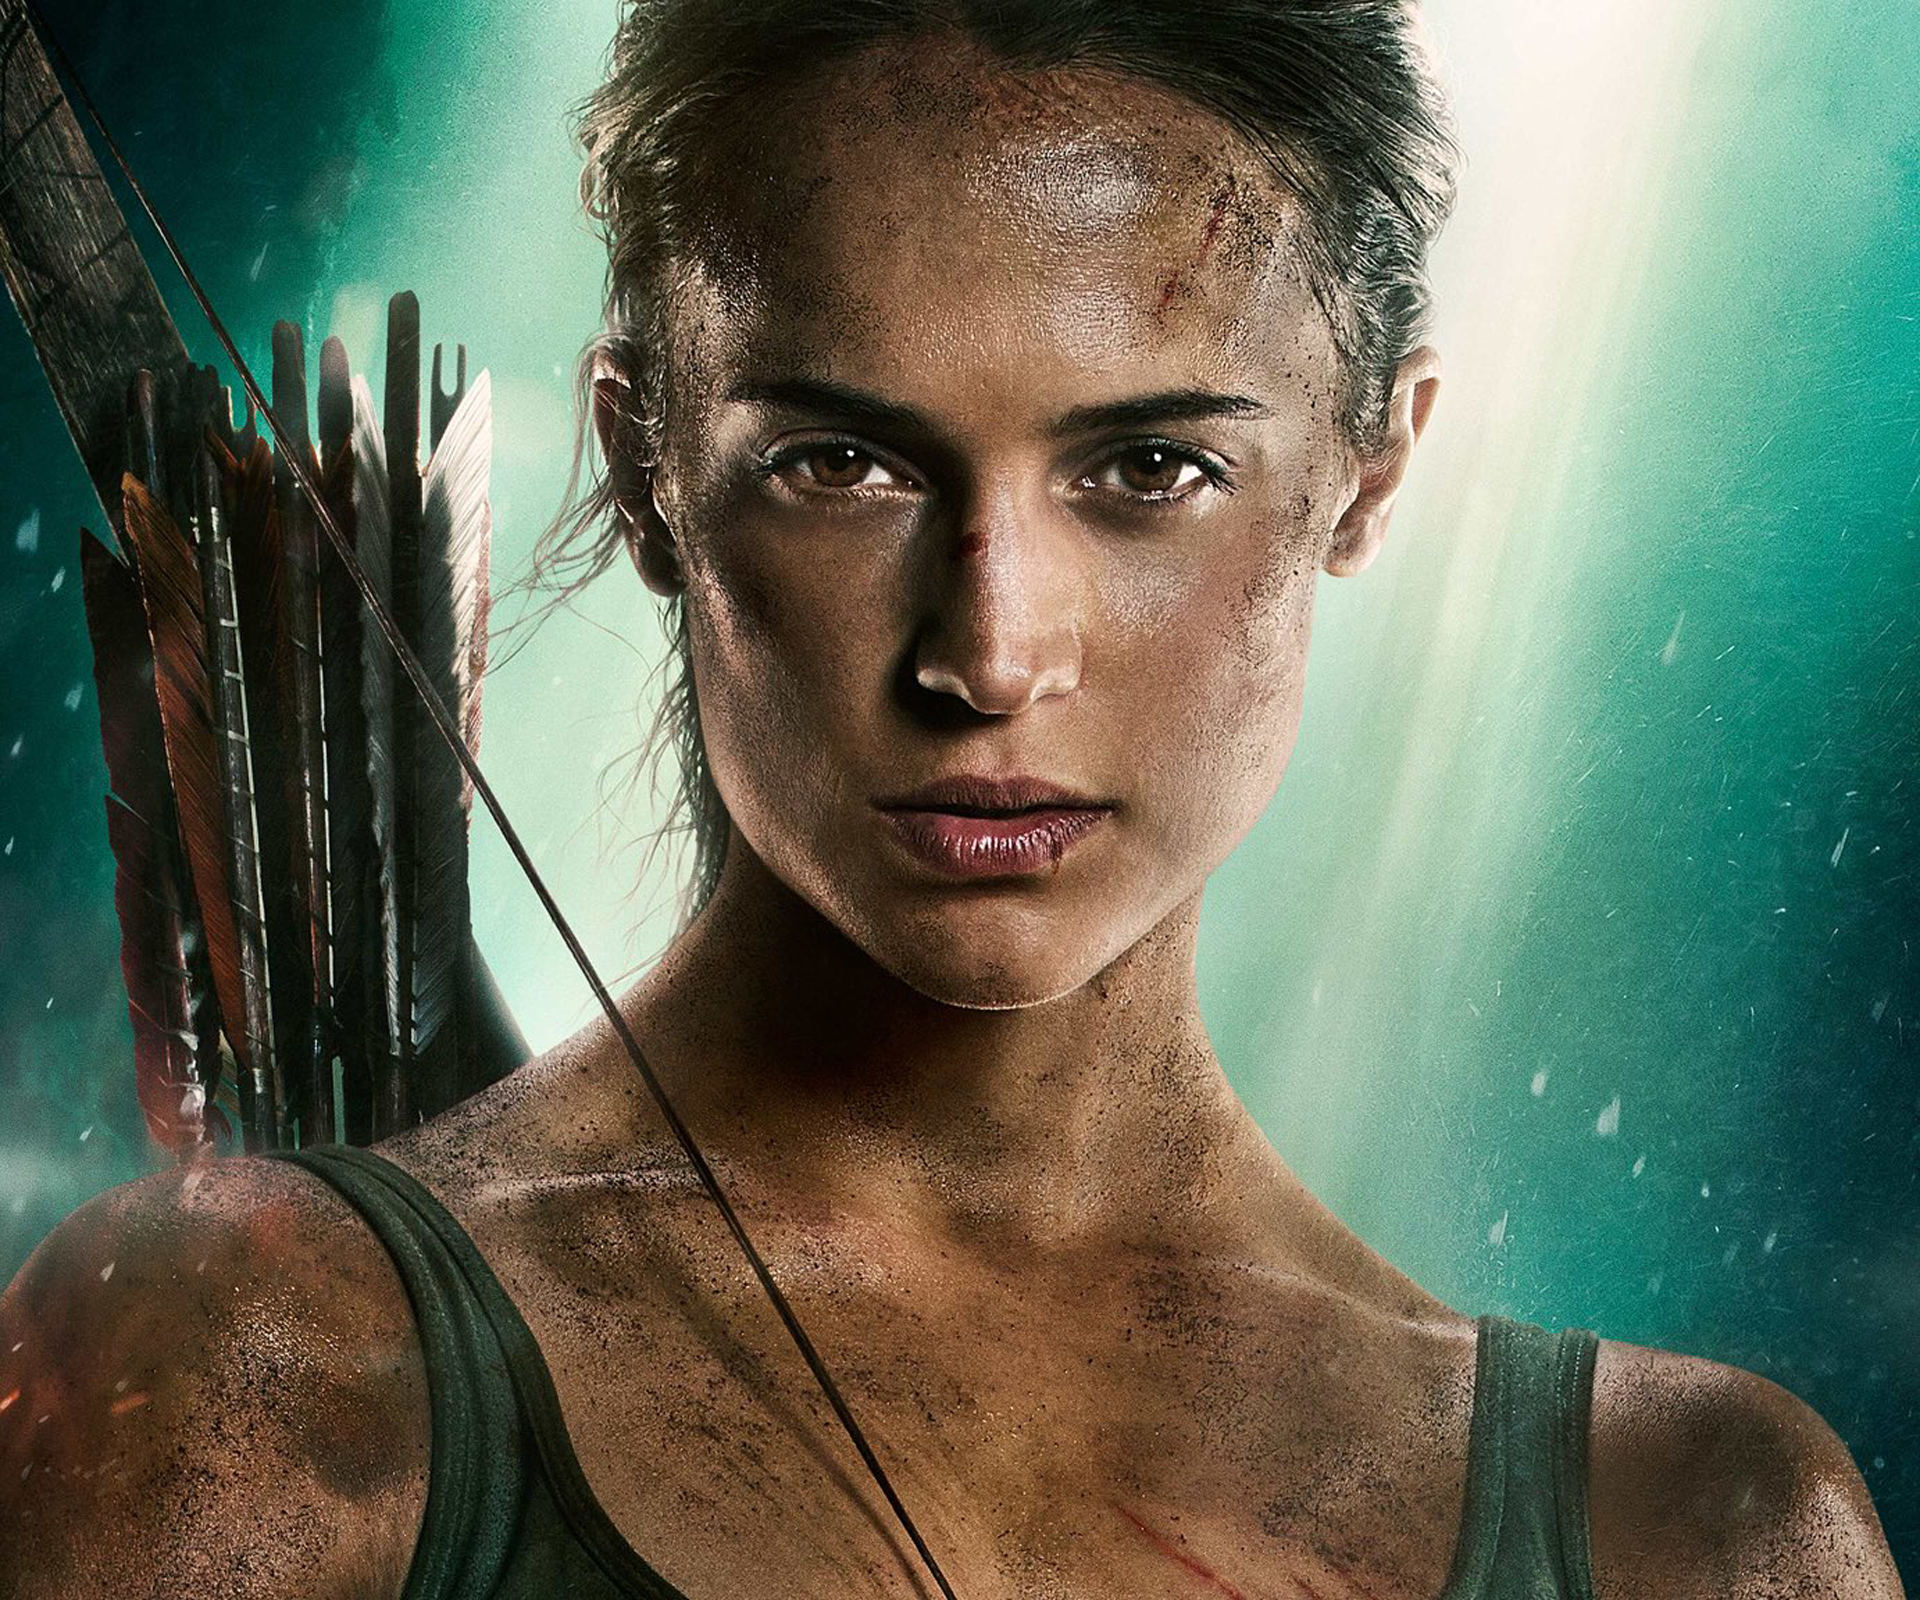 Alicia Vikander Tomb Raider 2018 Movie Full Hd Wallpaper: Alicia Vikander New Tomb Raider Poster 2018, Full HD Wallpaper